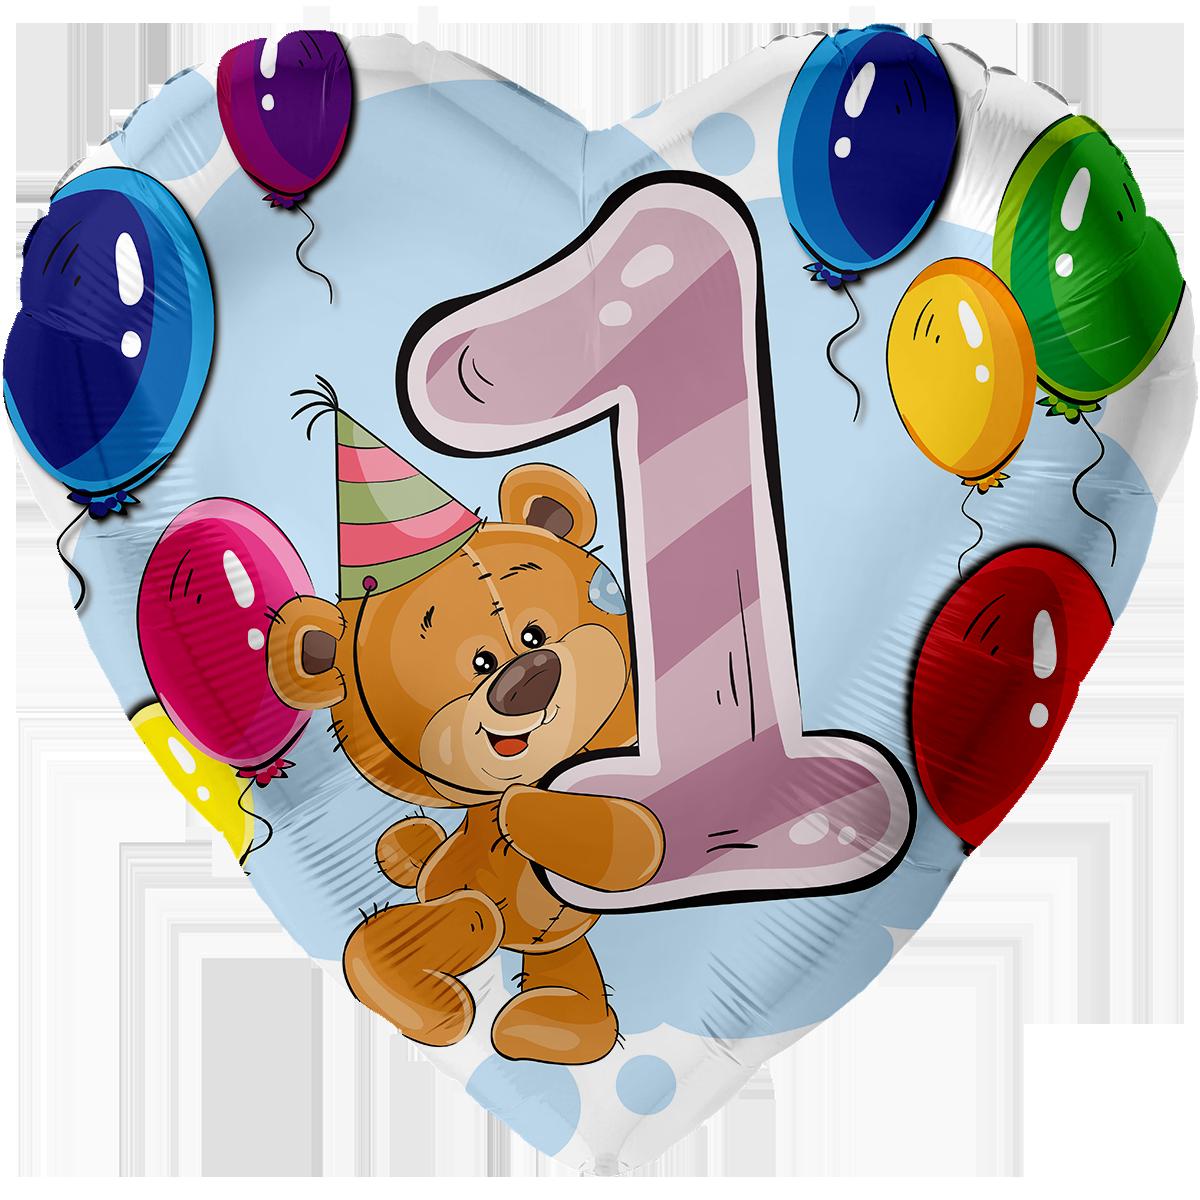 Barchenballon Zum 1 Geburtstag Party De